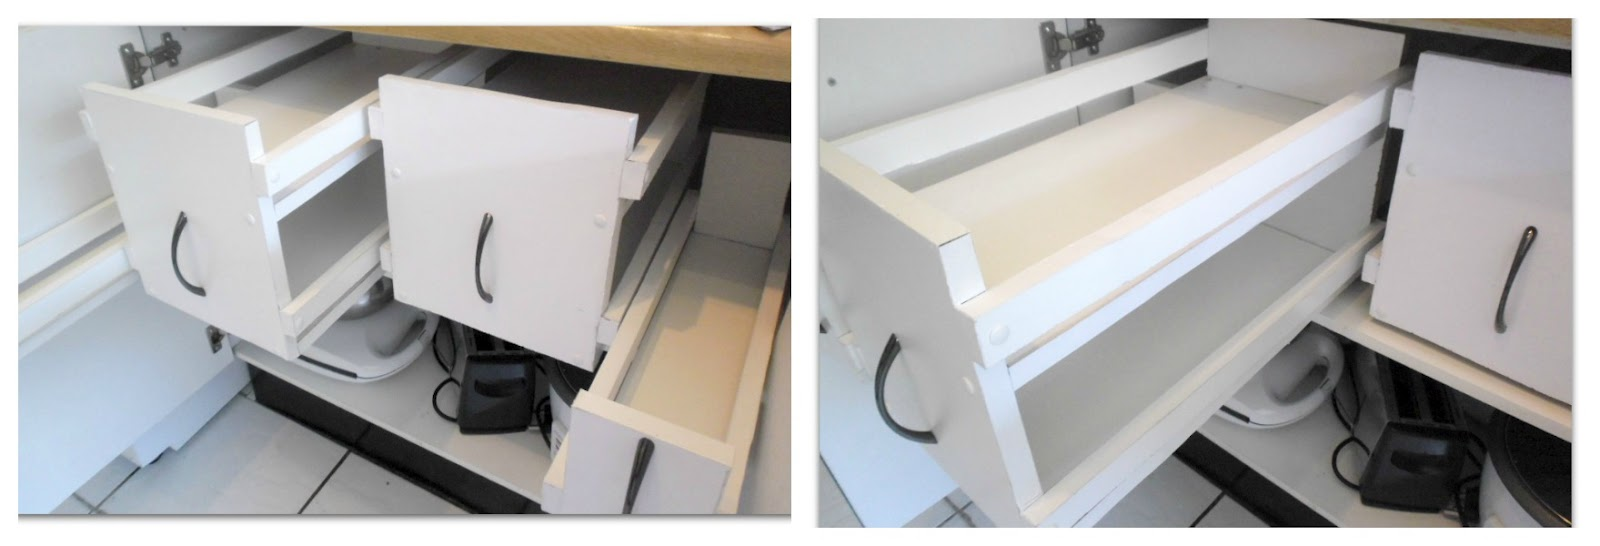 Kitchen Cabinet Wraps Is Peeling Off